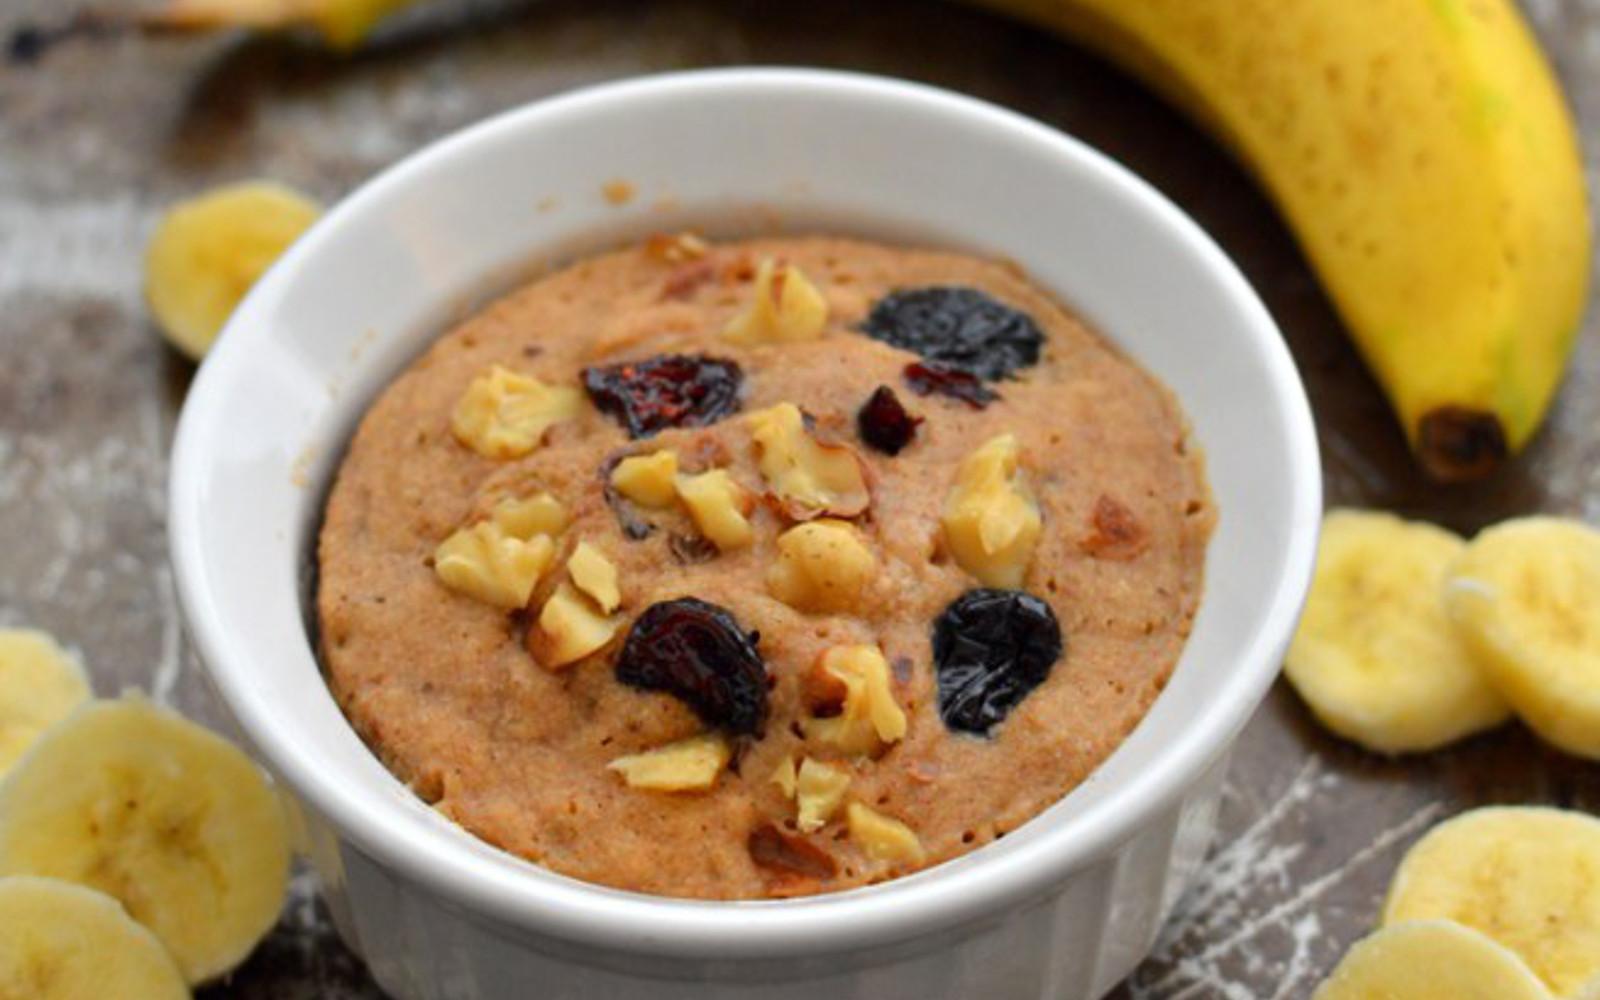 Vegan GLuten-Free Banana Bread Mug Cake with nuts and raisins